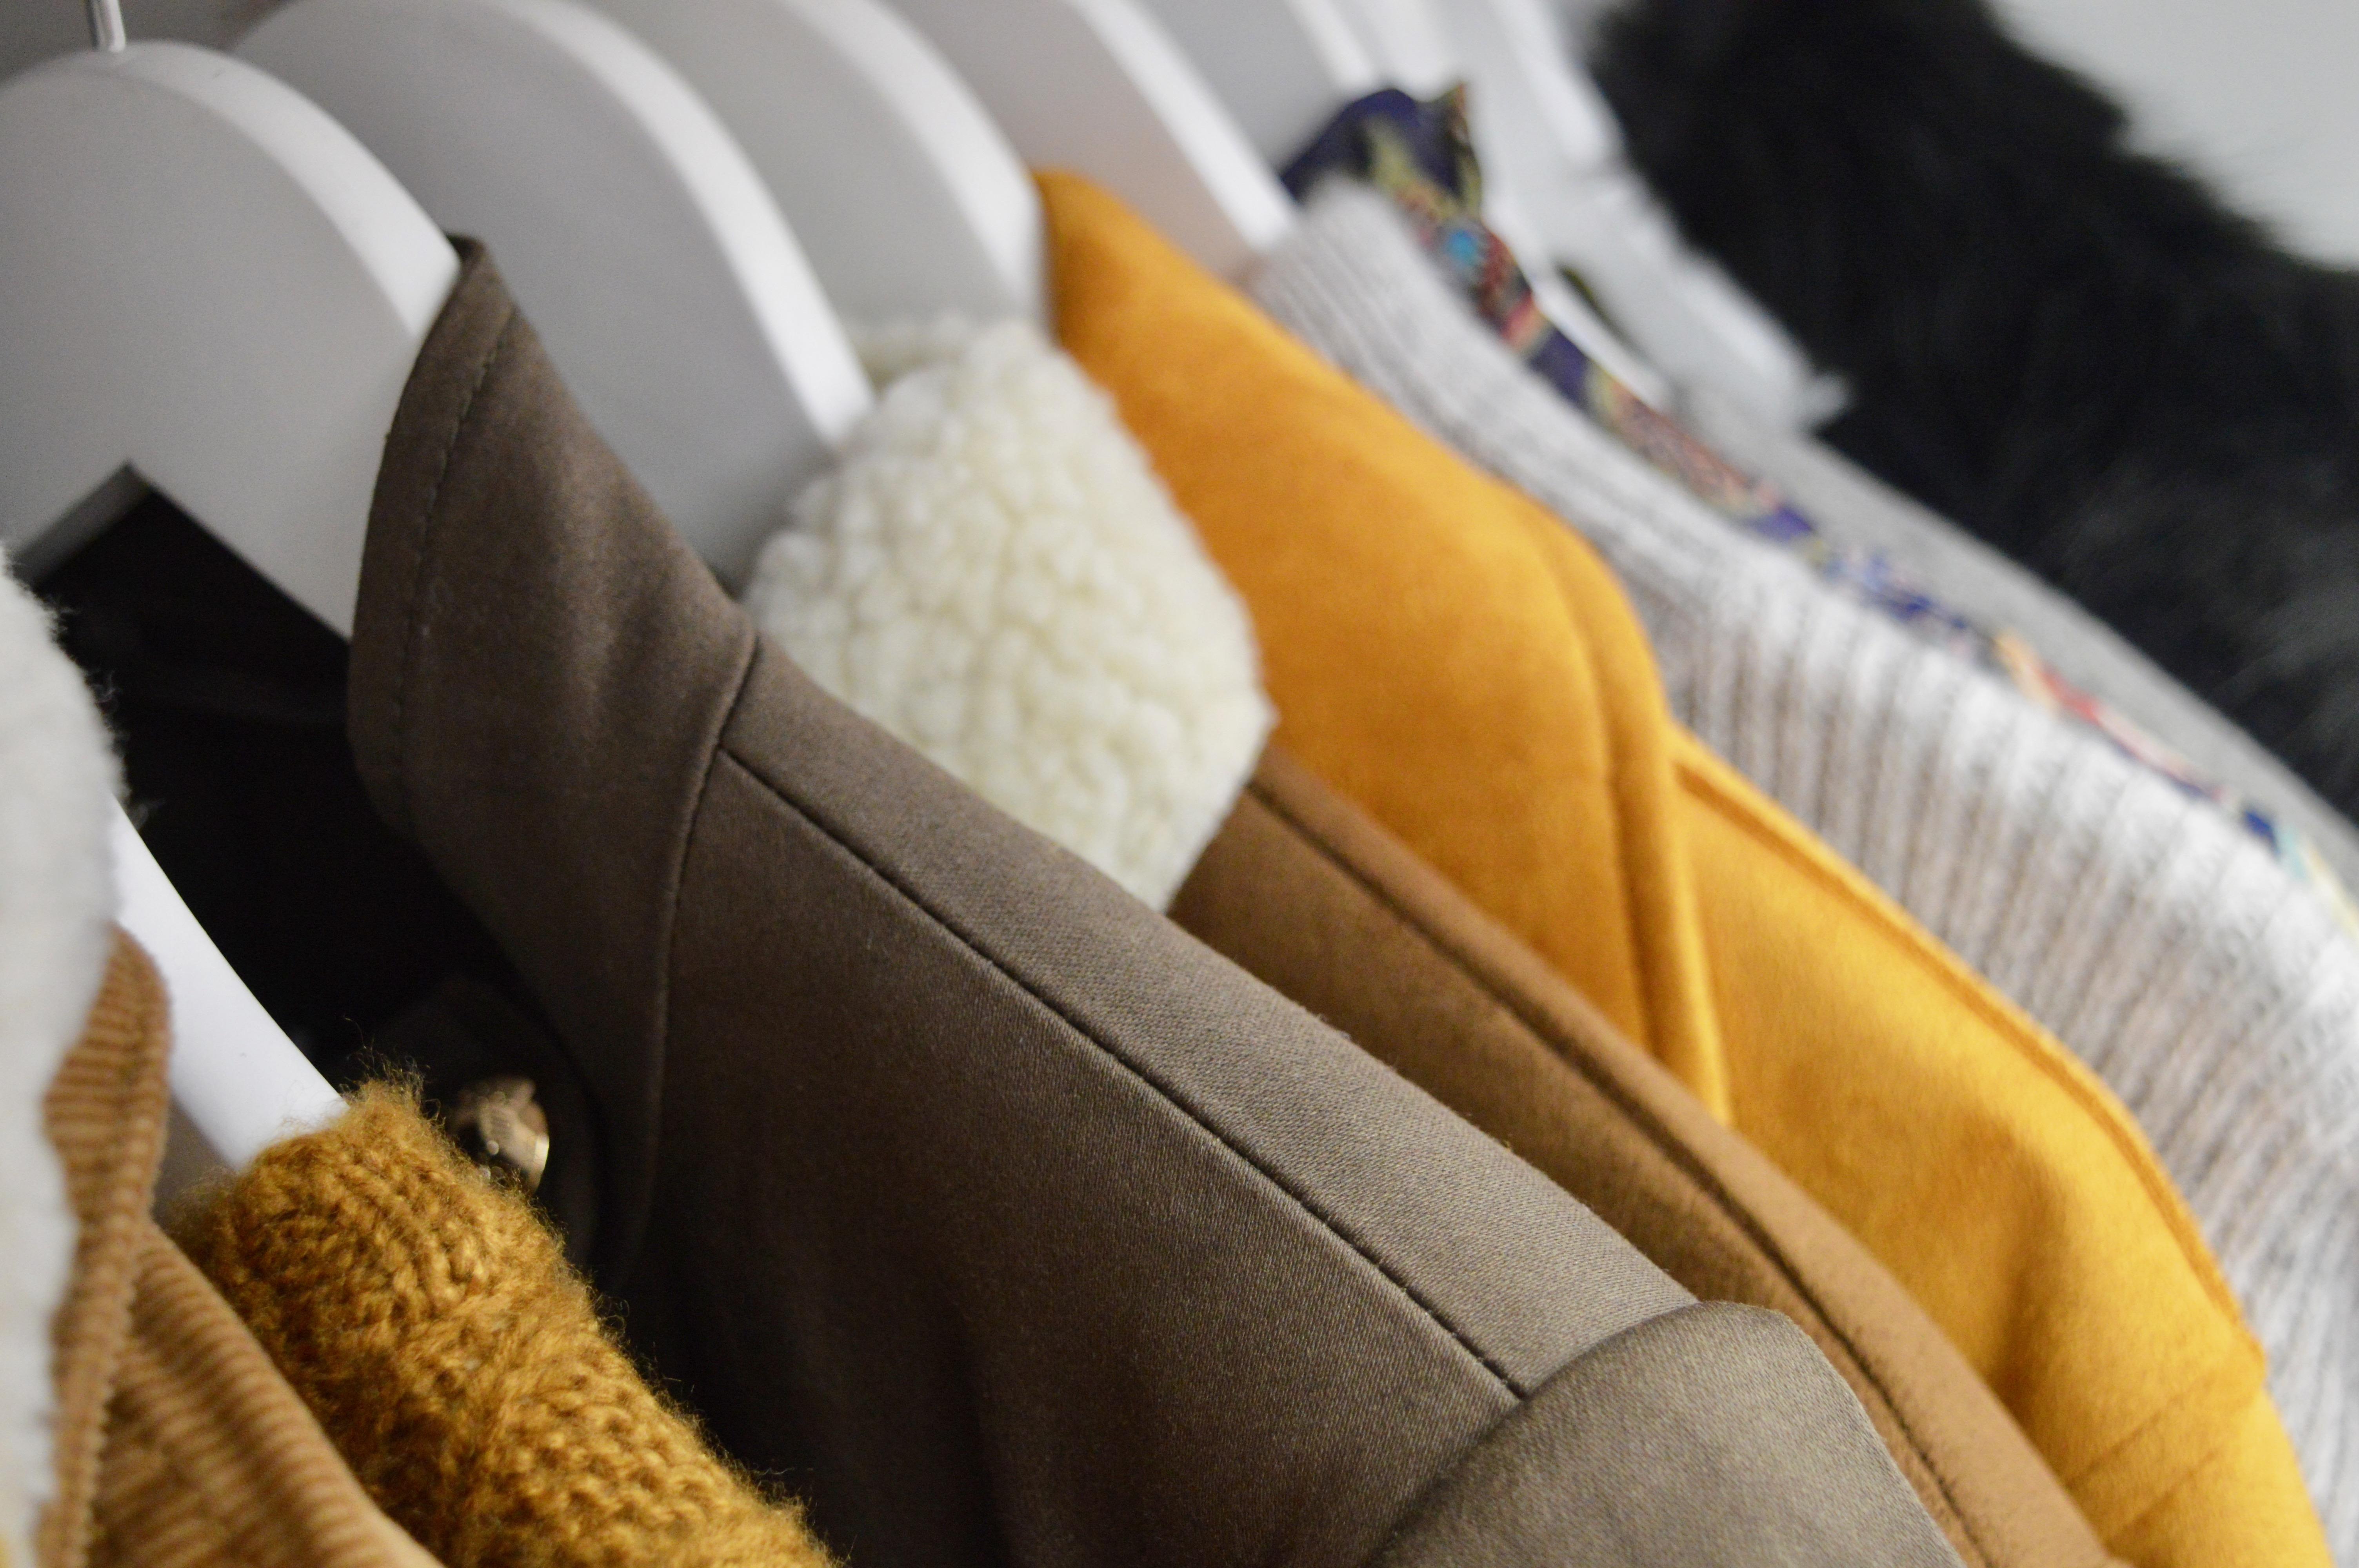 mustard-grey-khaki-intu-eldon-square-winter-fashion-stylissimo-newcastle-high-street-halloween-elle-blonde-luxury-lifestyle-destination-blog